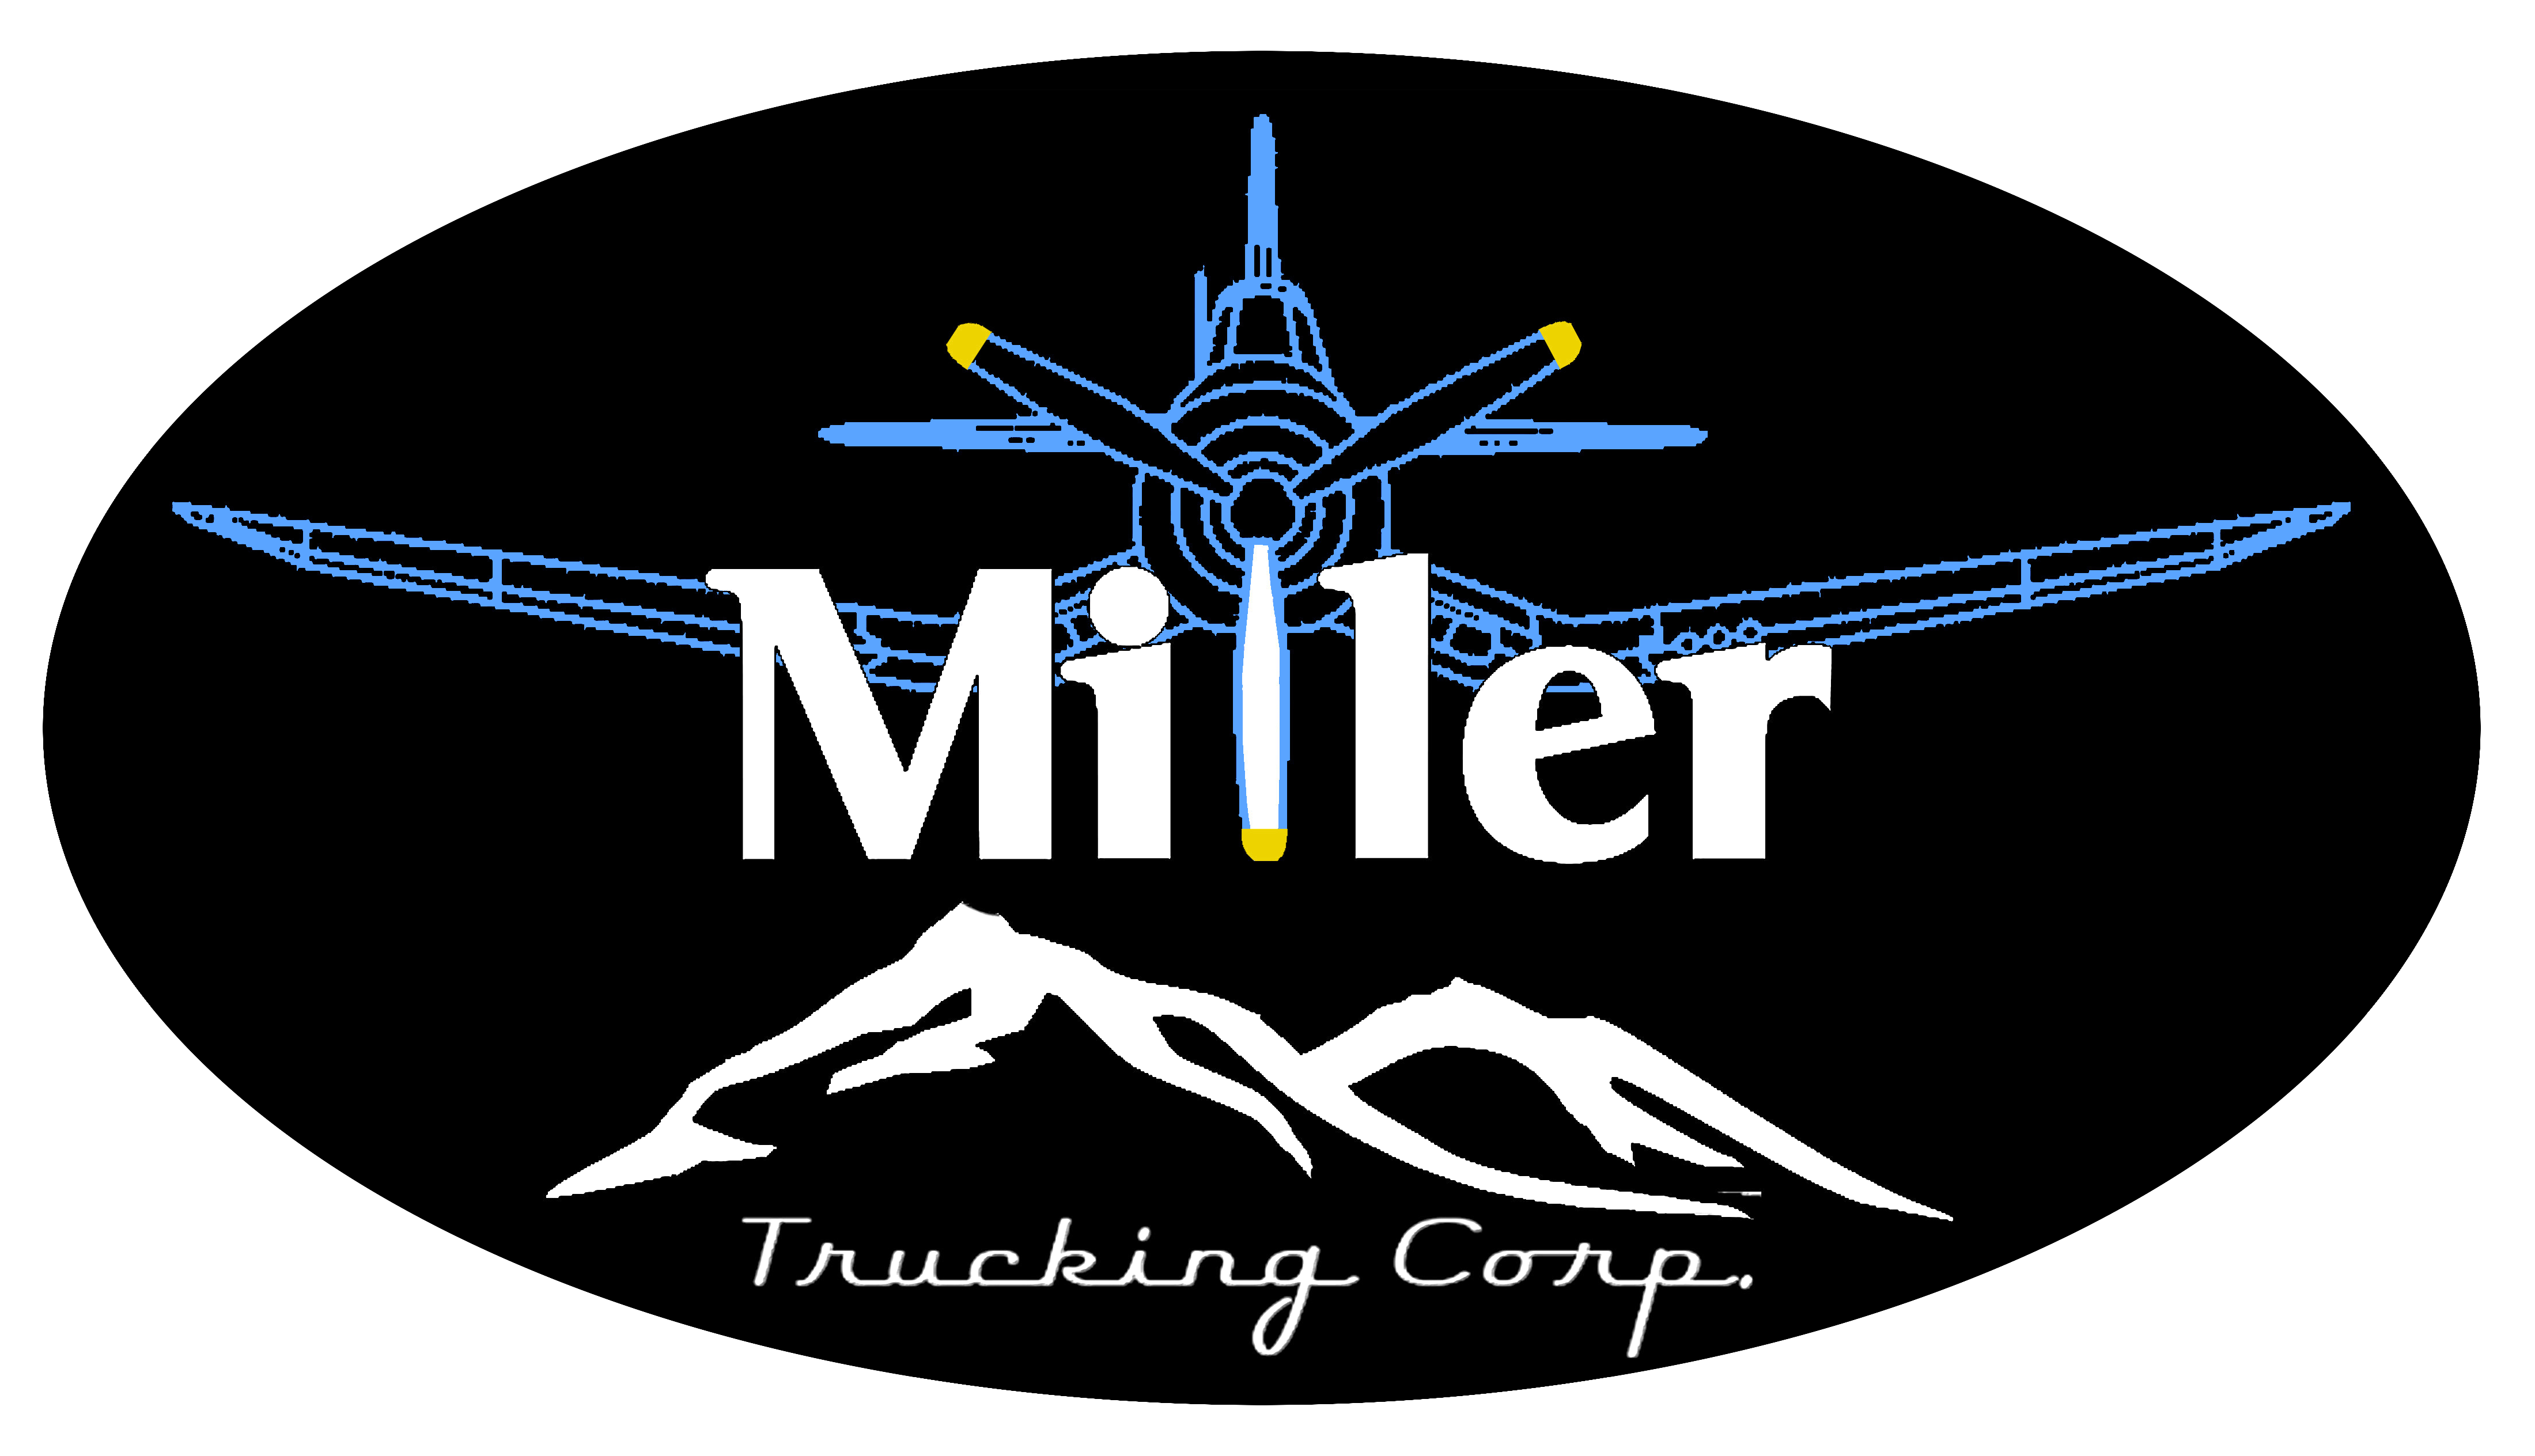 Miller Trucking Corpoation